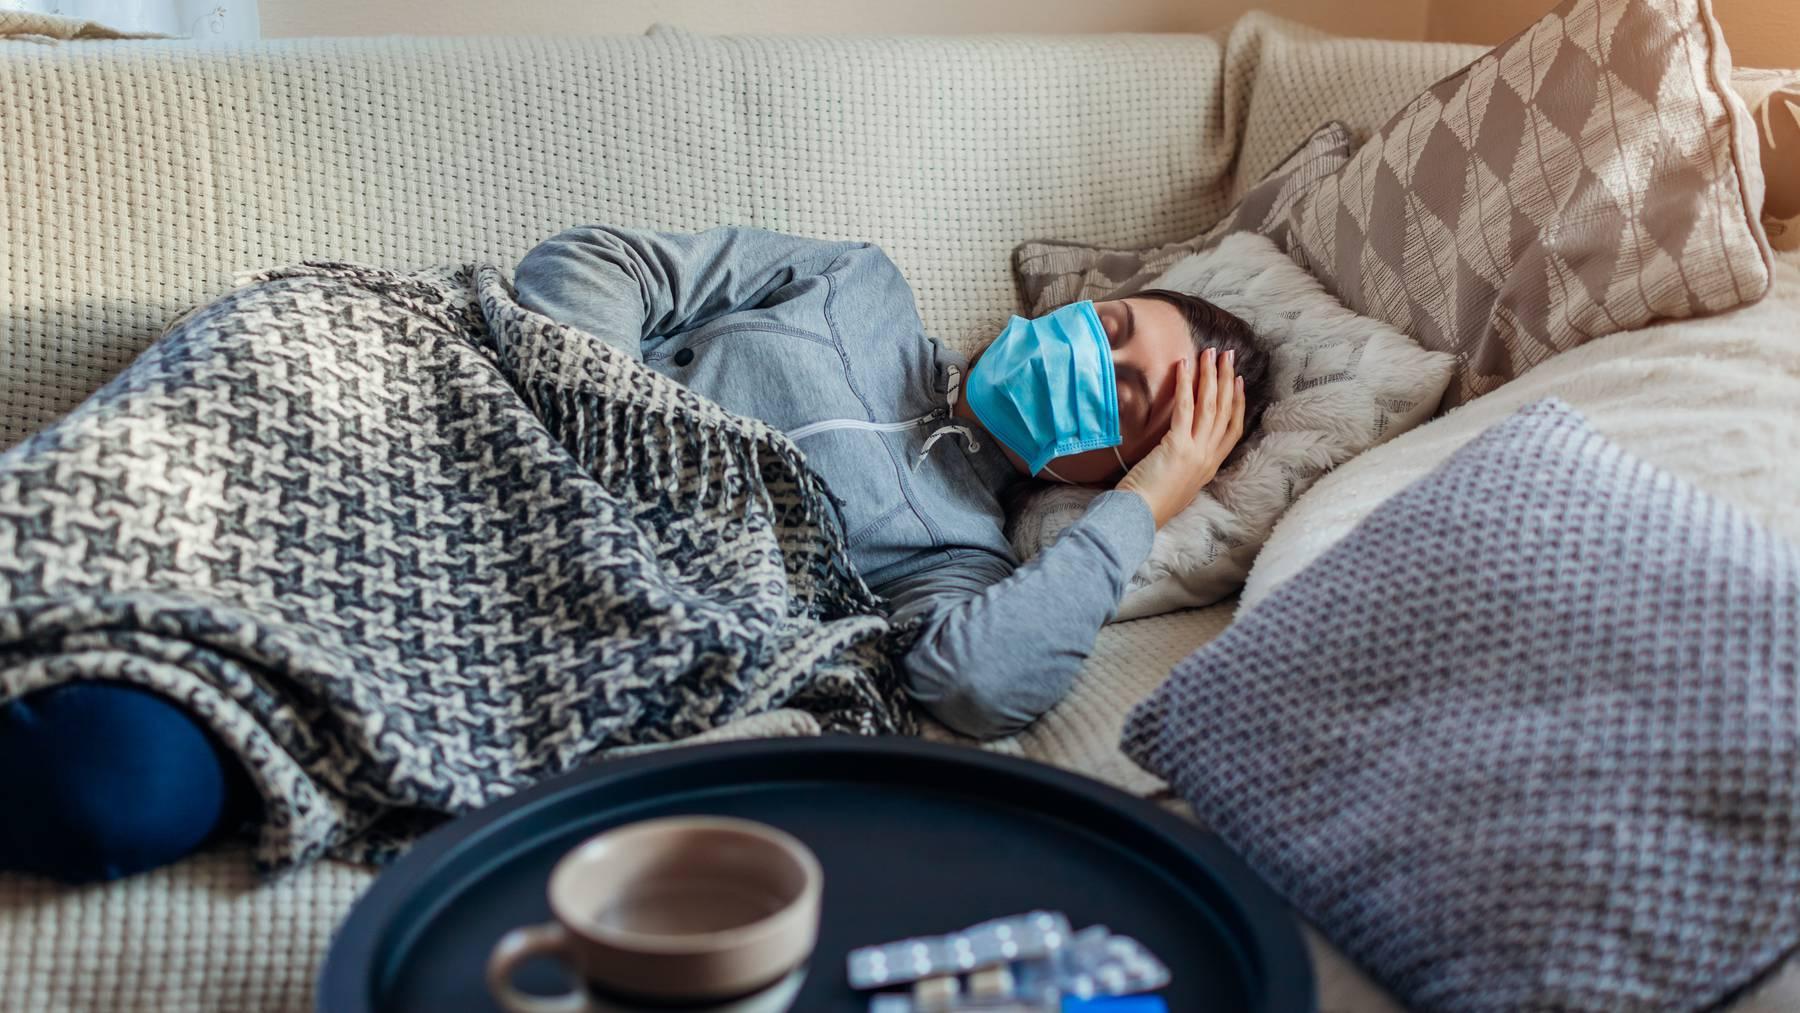 Krank Grippe Corona